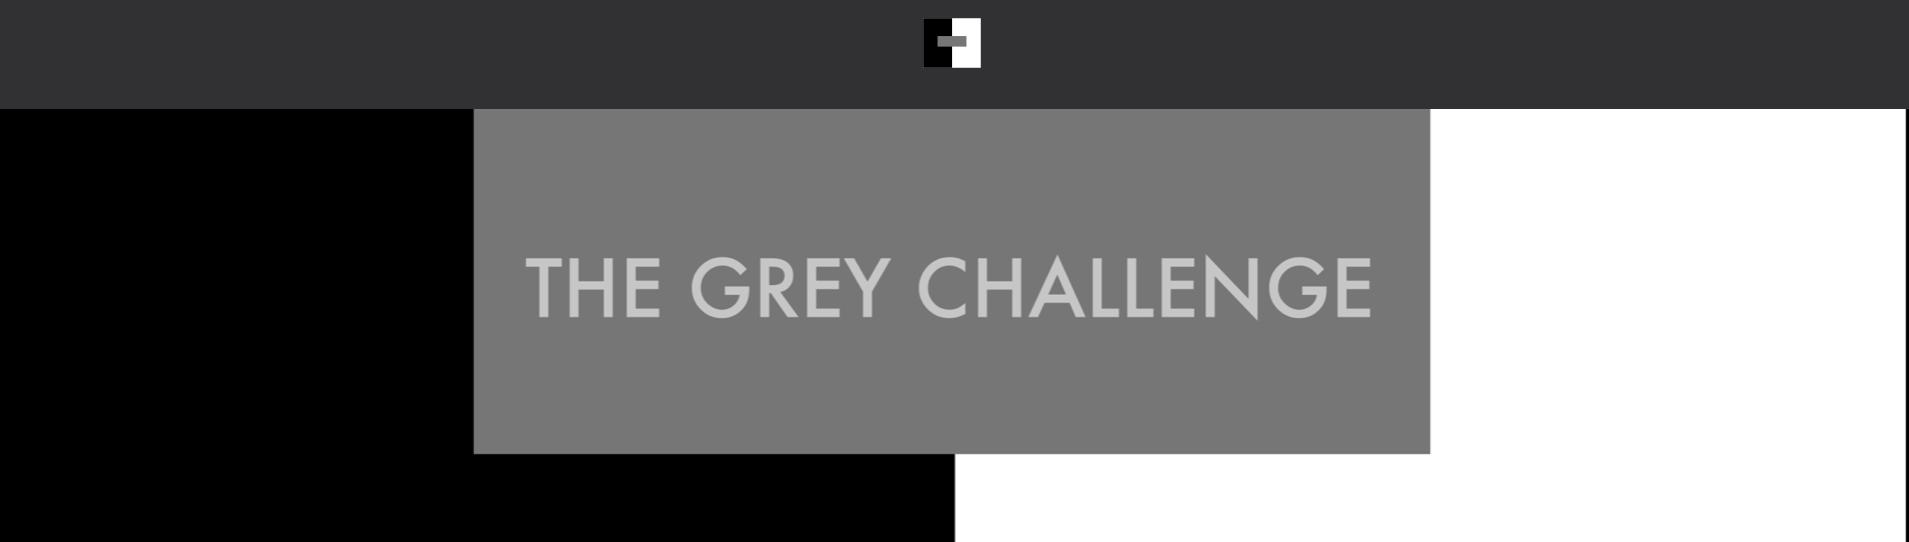 The Grey Challenge